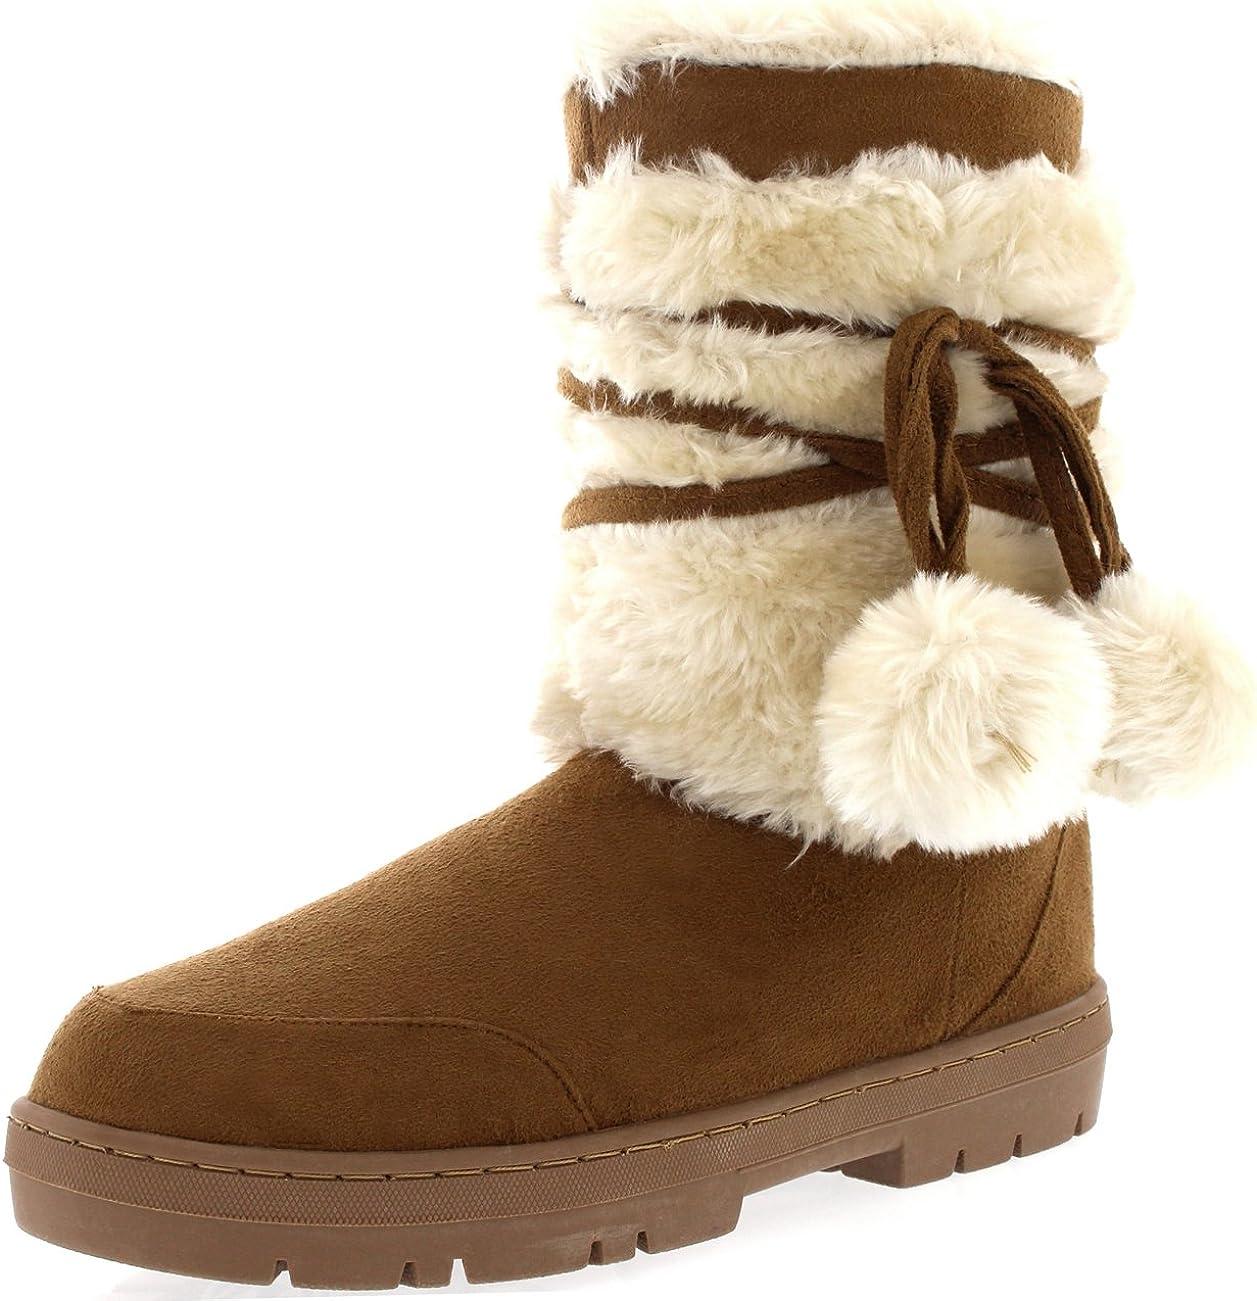 Holly Womens Pom Pom Waterproof Winter Snow Boots